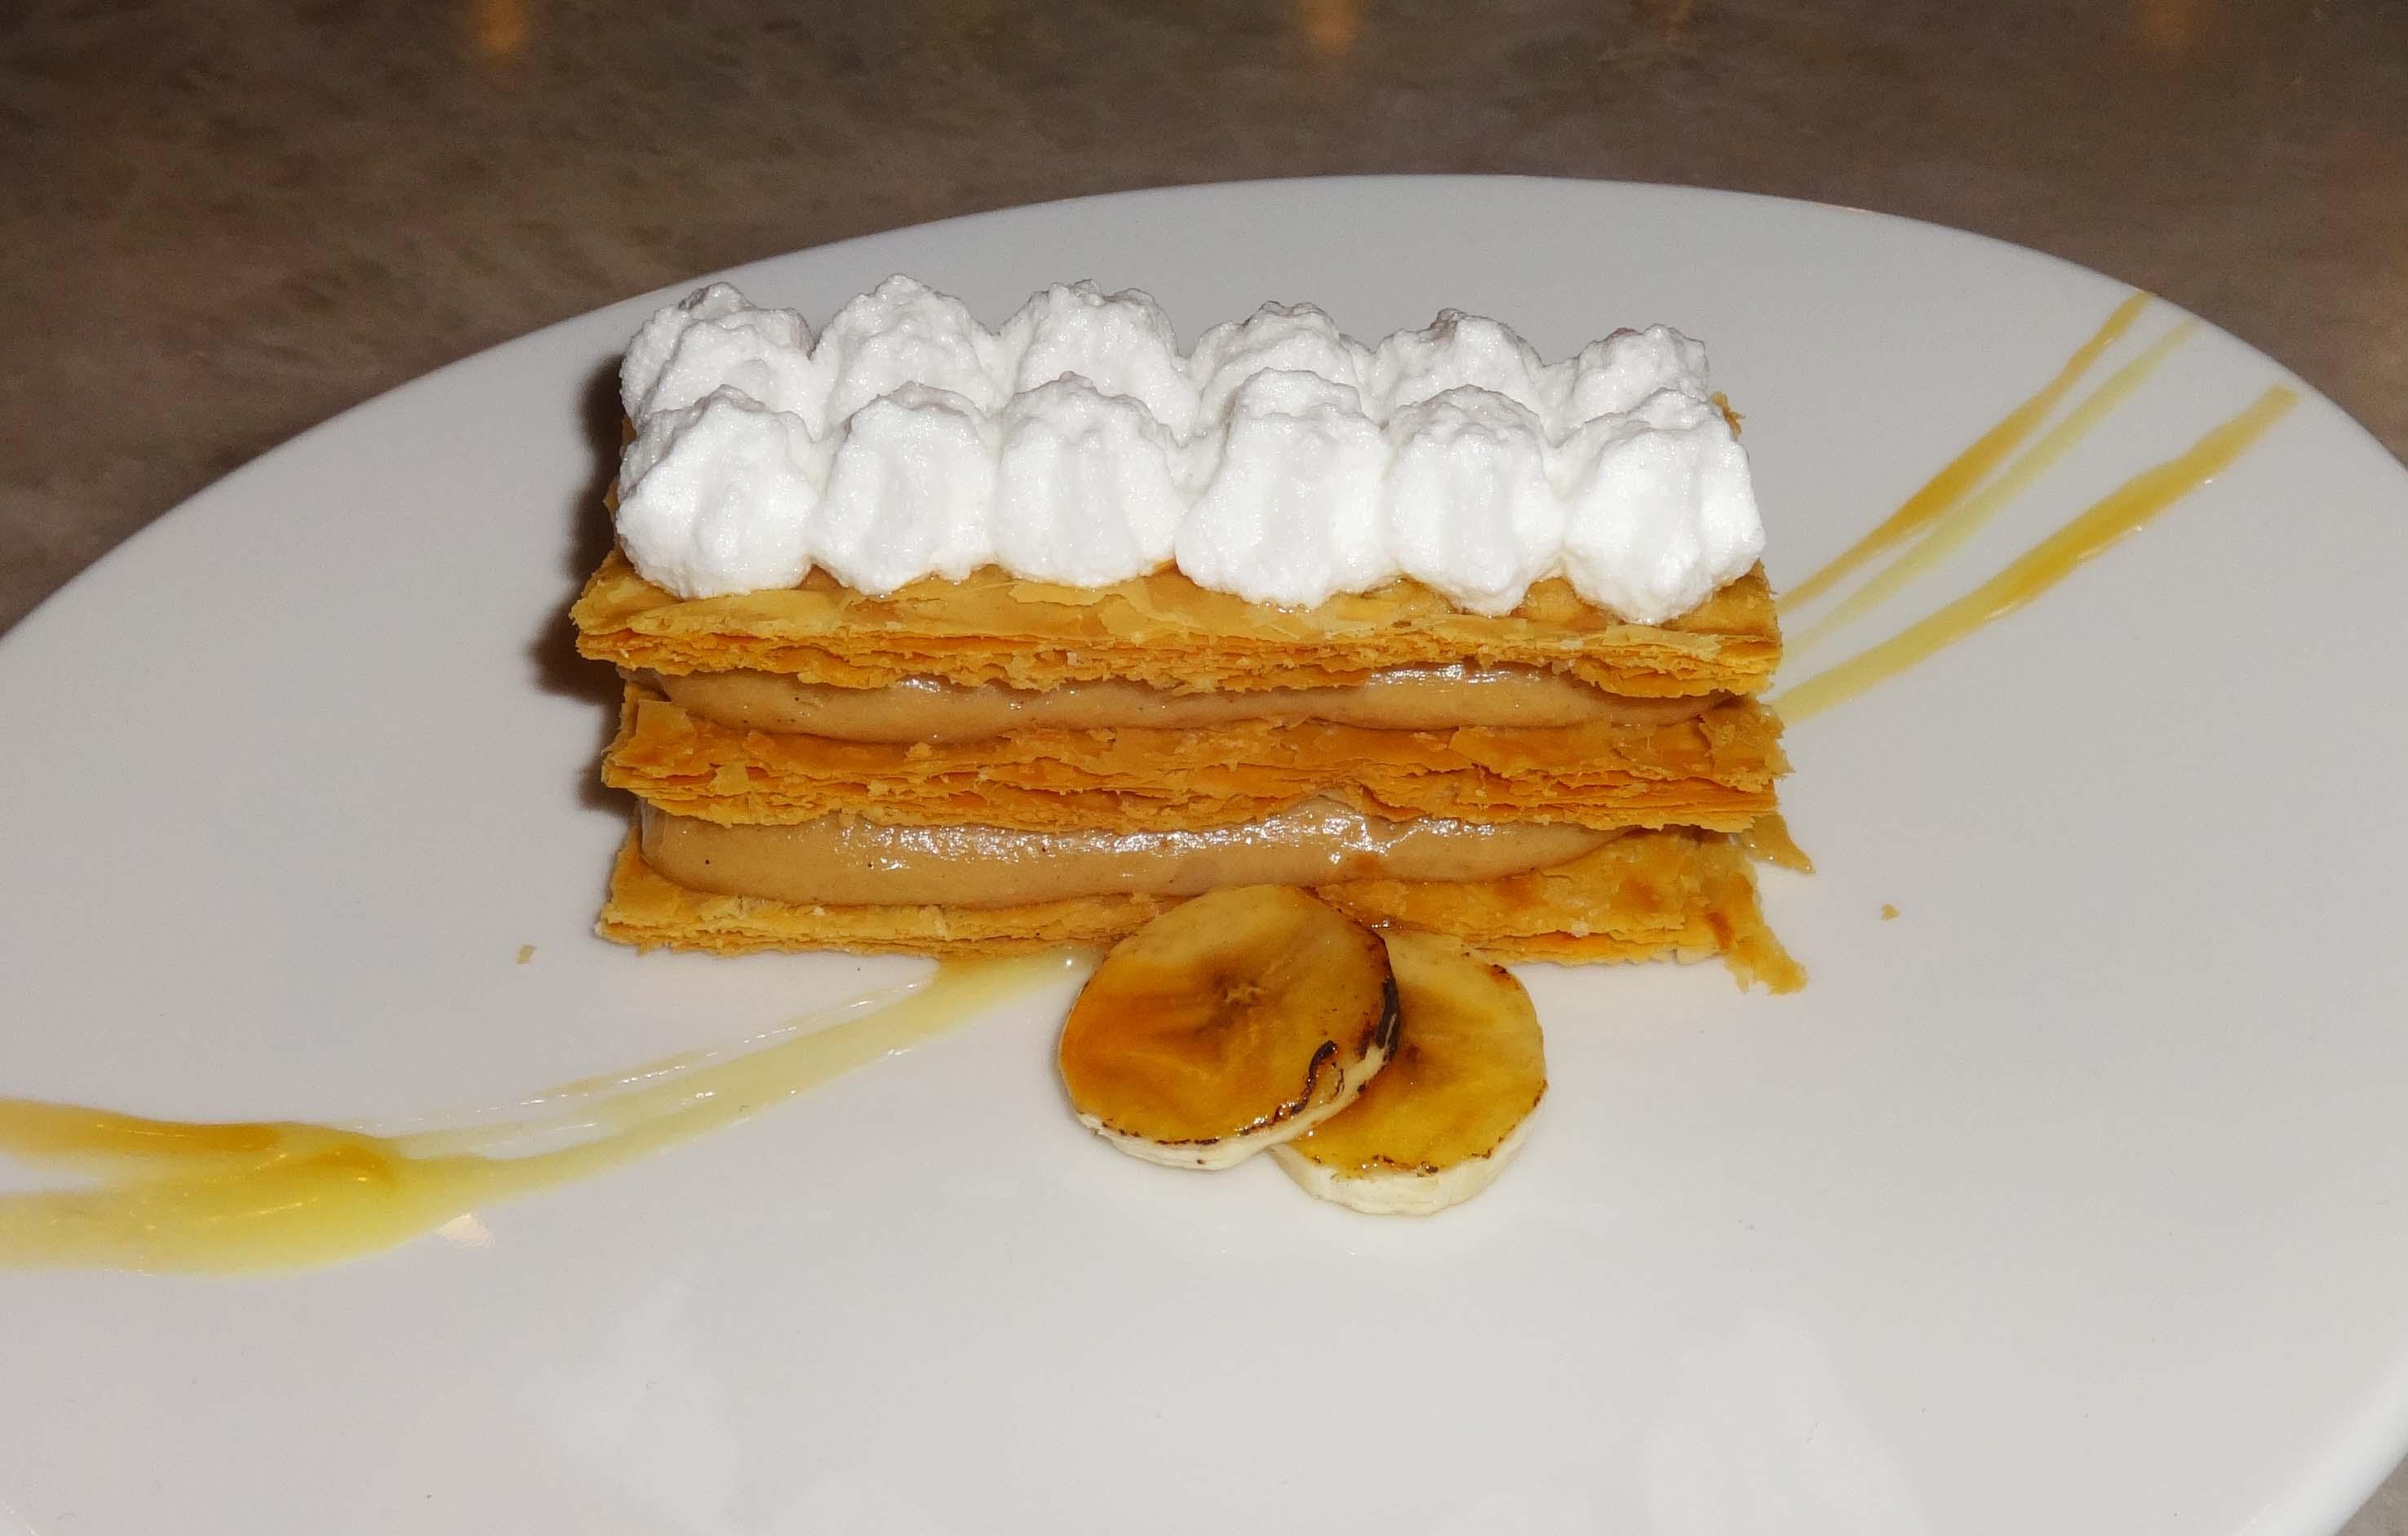 Amada dessert